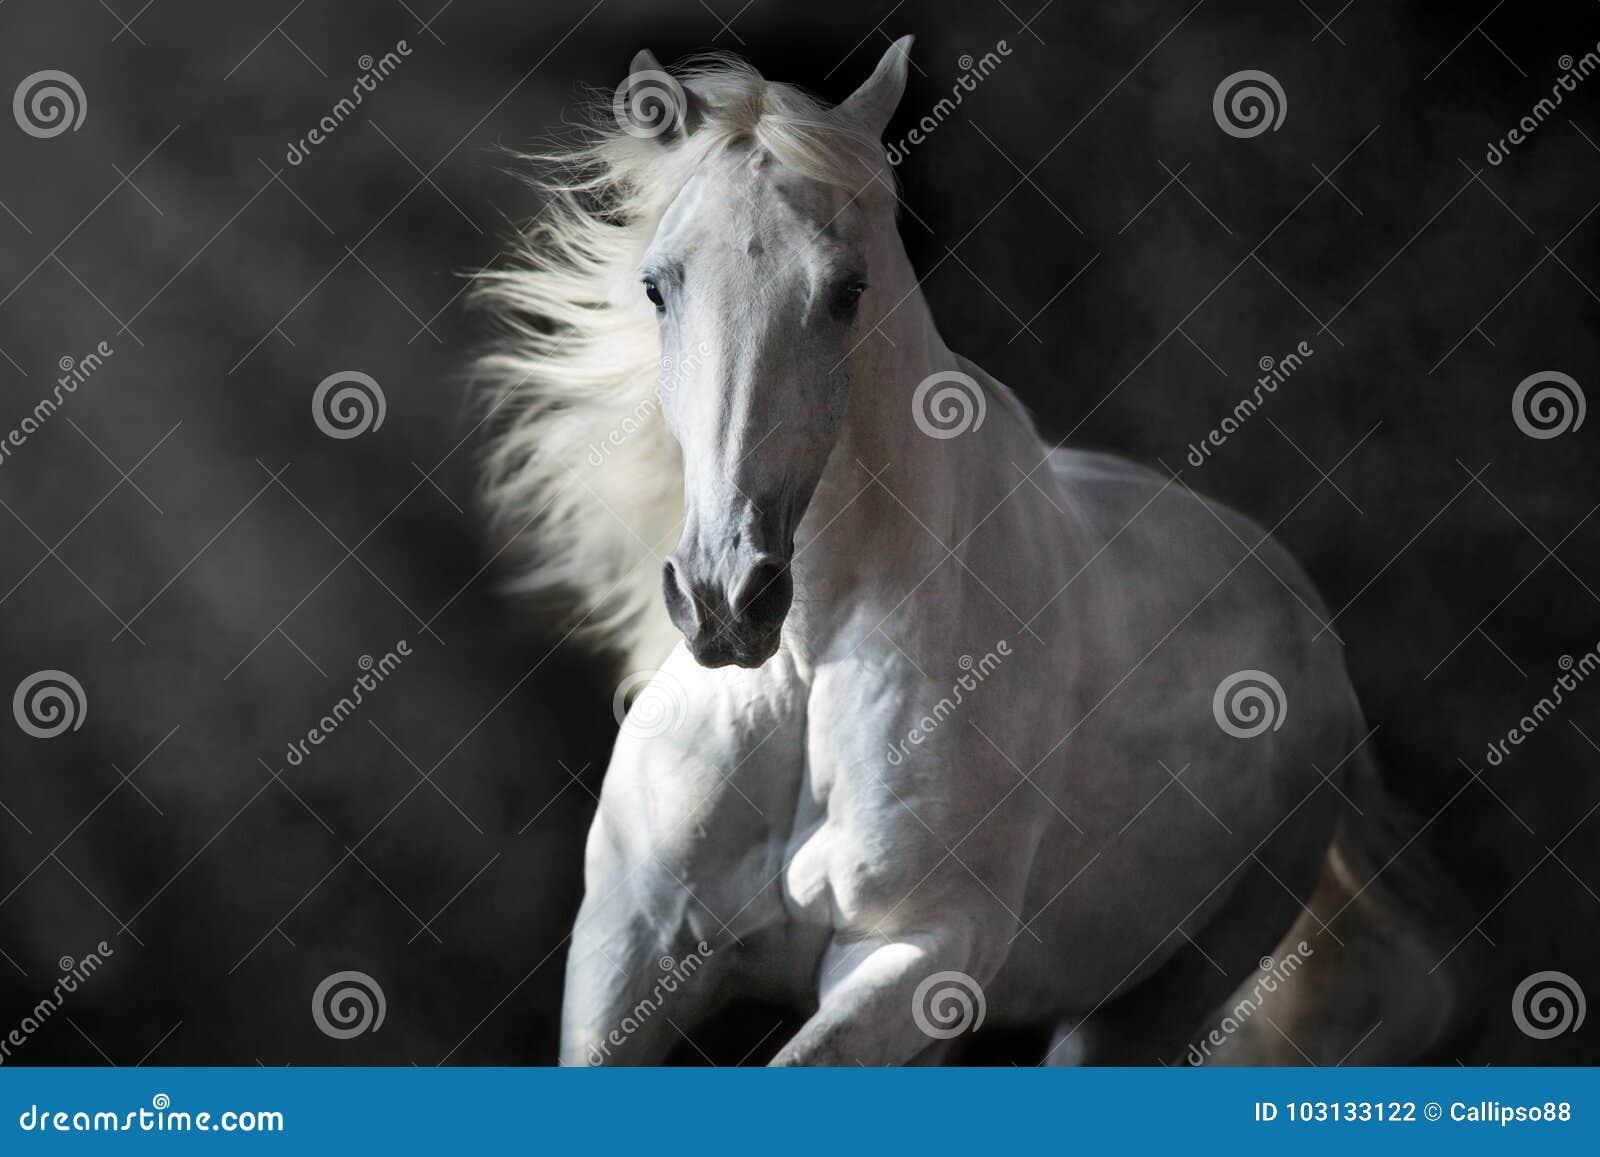 Wit $c-andalusisch paard in motie